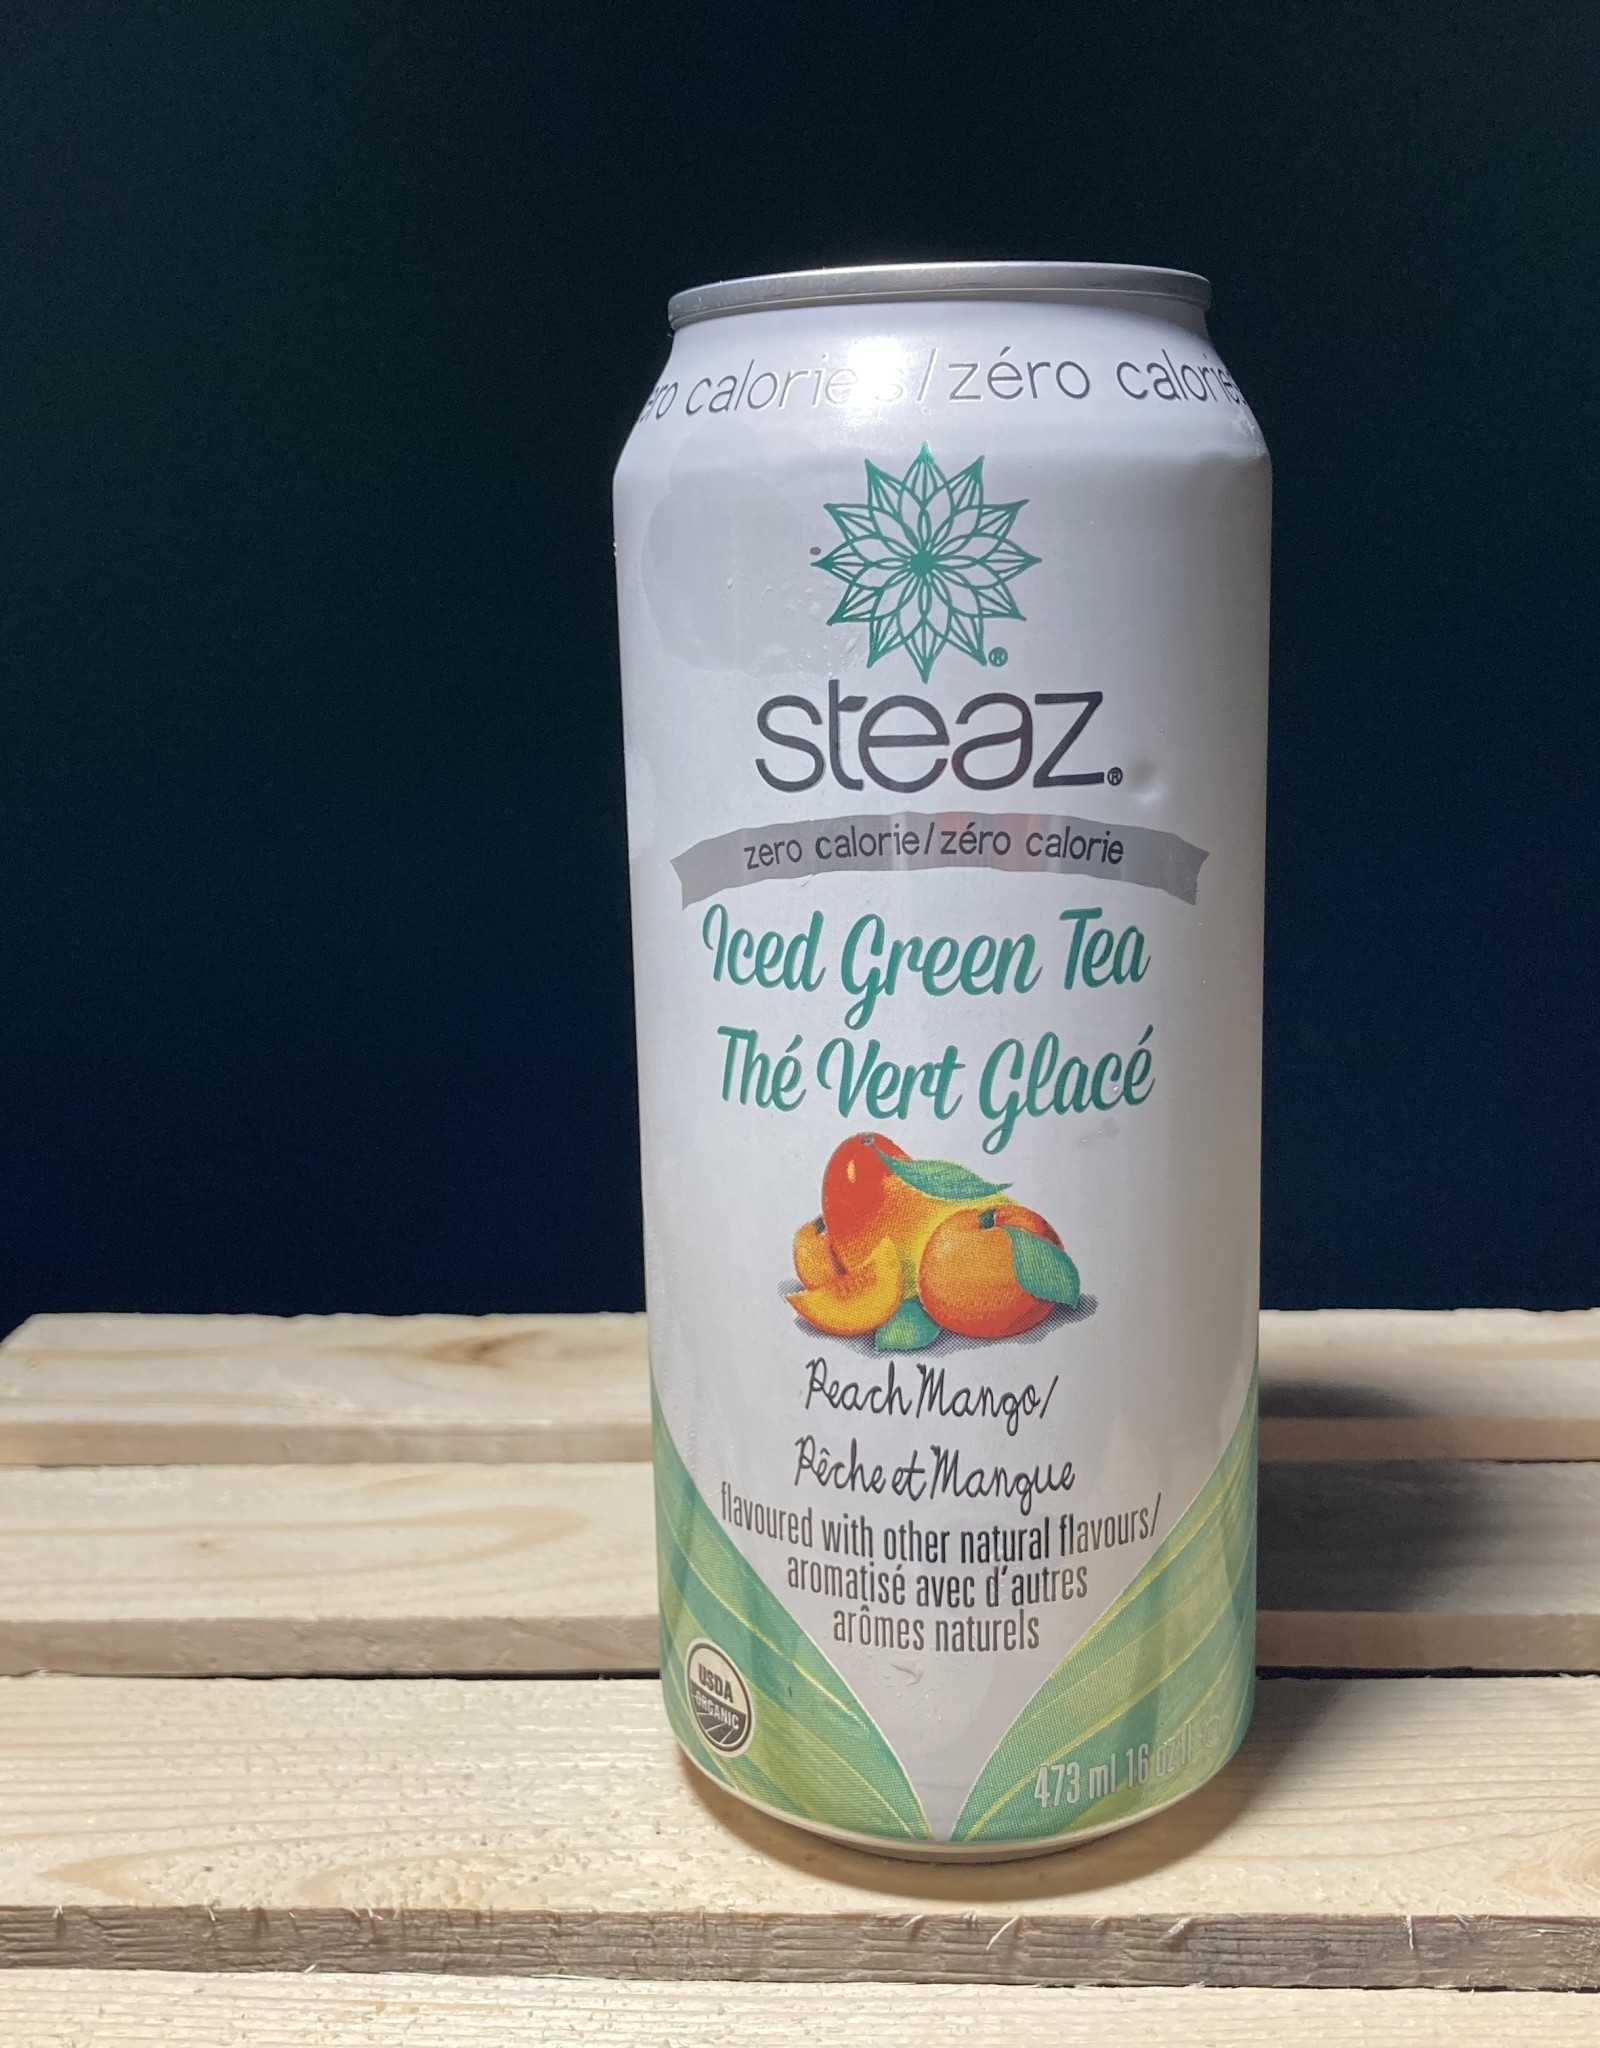 Steaz Steaz - Ice Teaz Zero Calorie, Peach Mango (473ml)